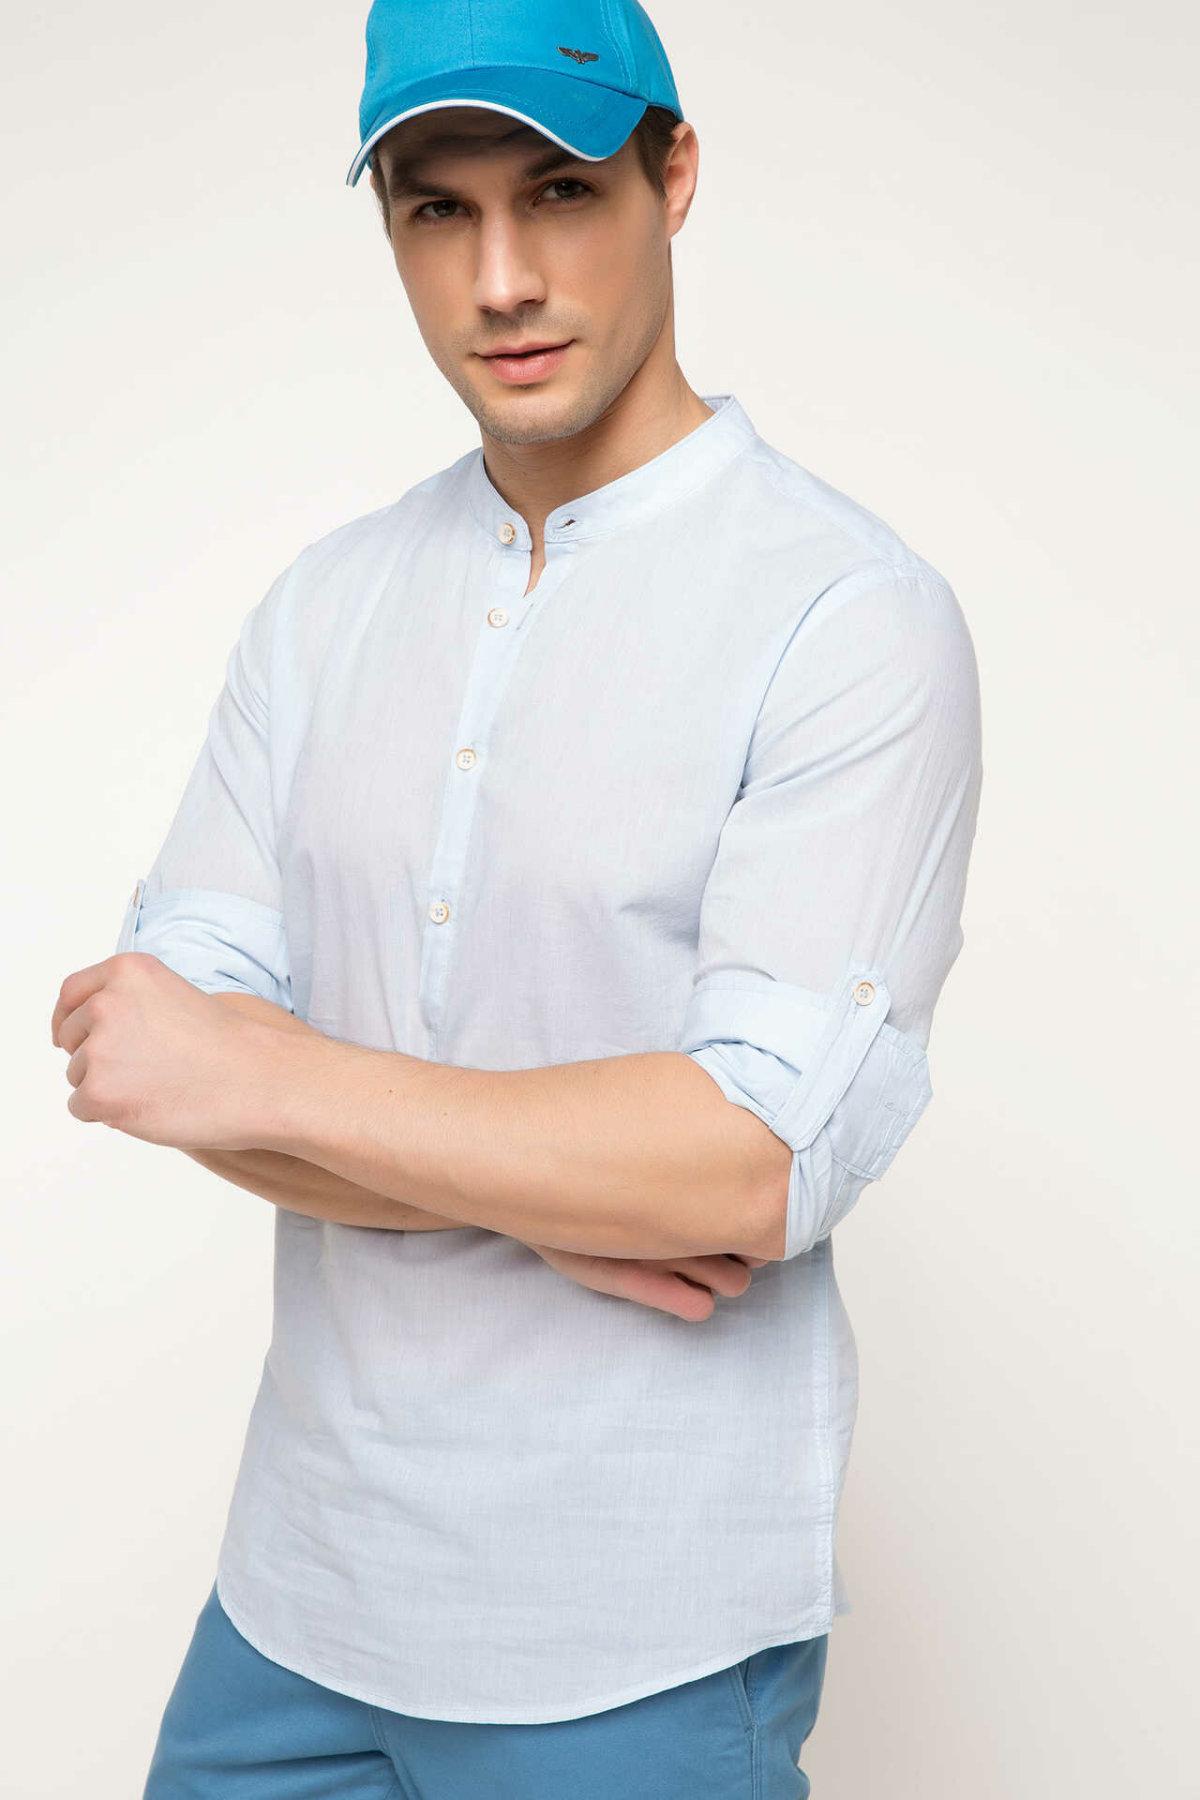 DeFacto Men Fashion Formal White Stand Collar Shirt Woven Top Short Sleeve Shirt Casual Business Wear Top Shirt-G8832AZ17SM